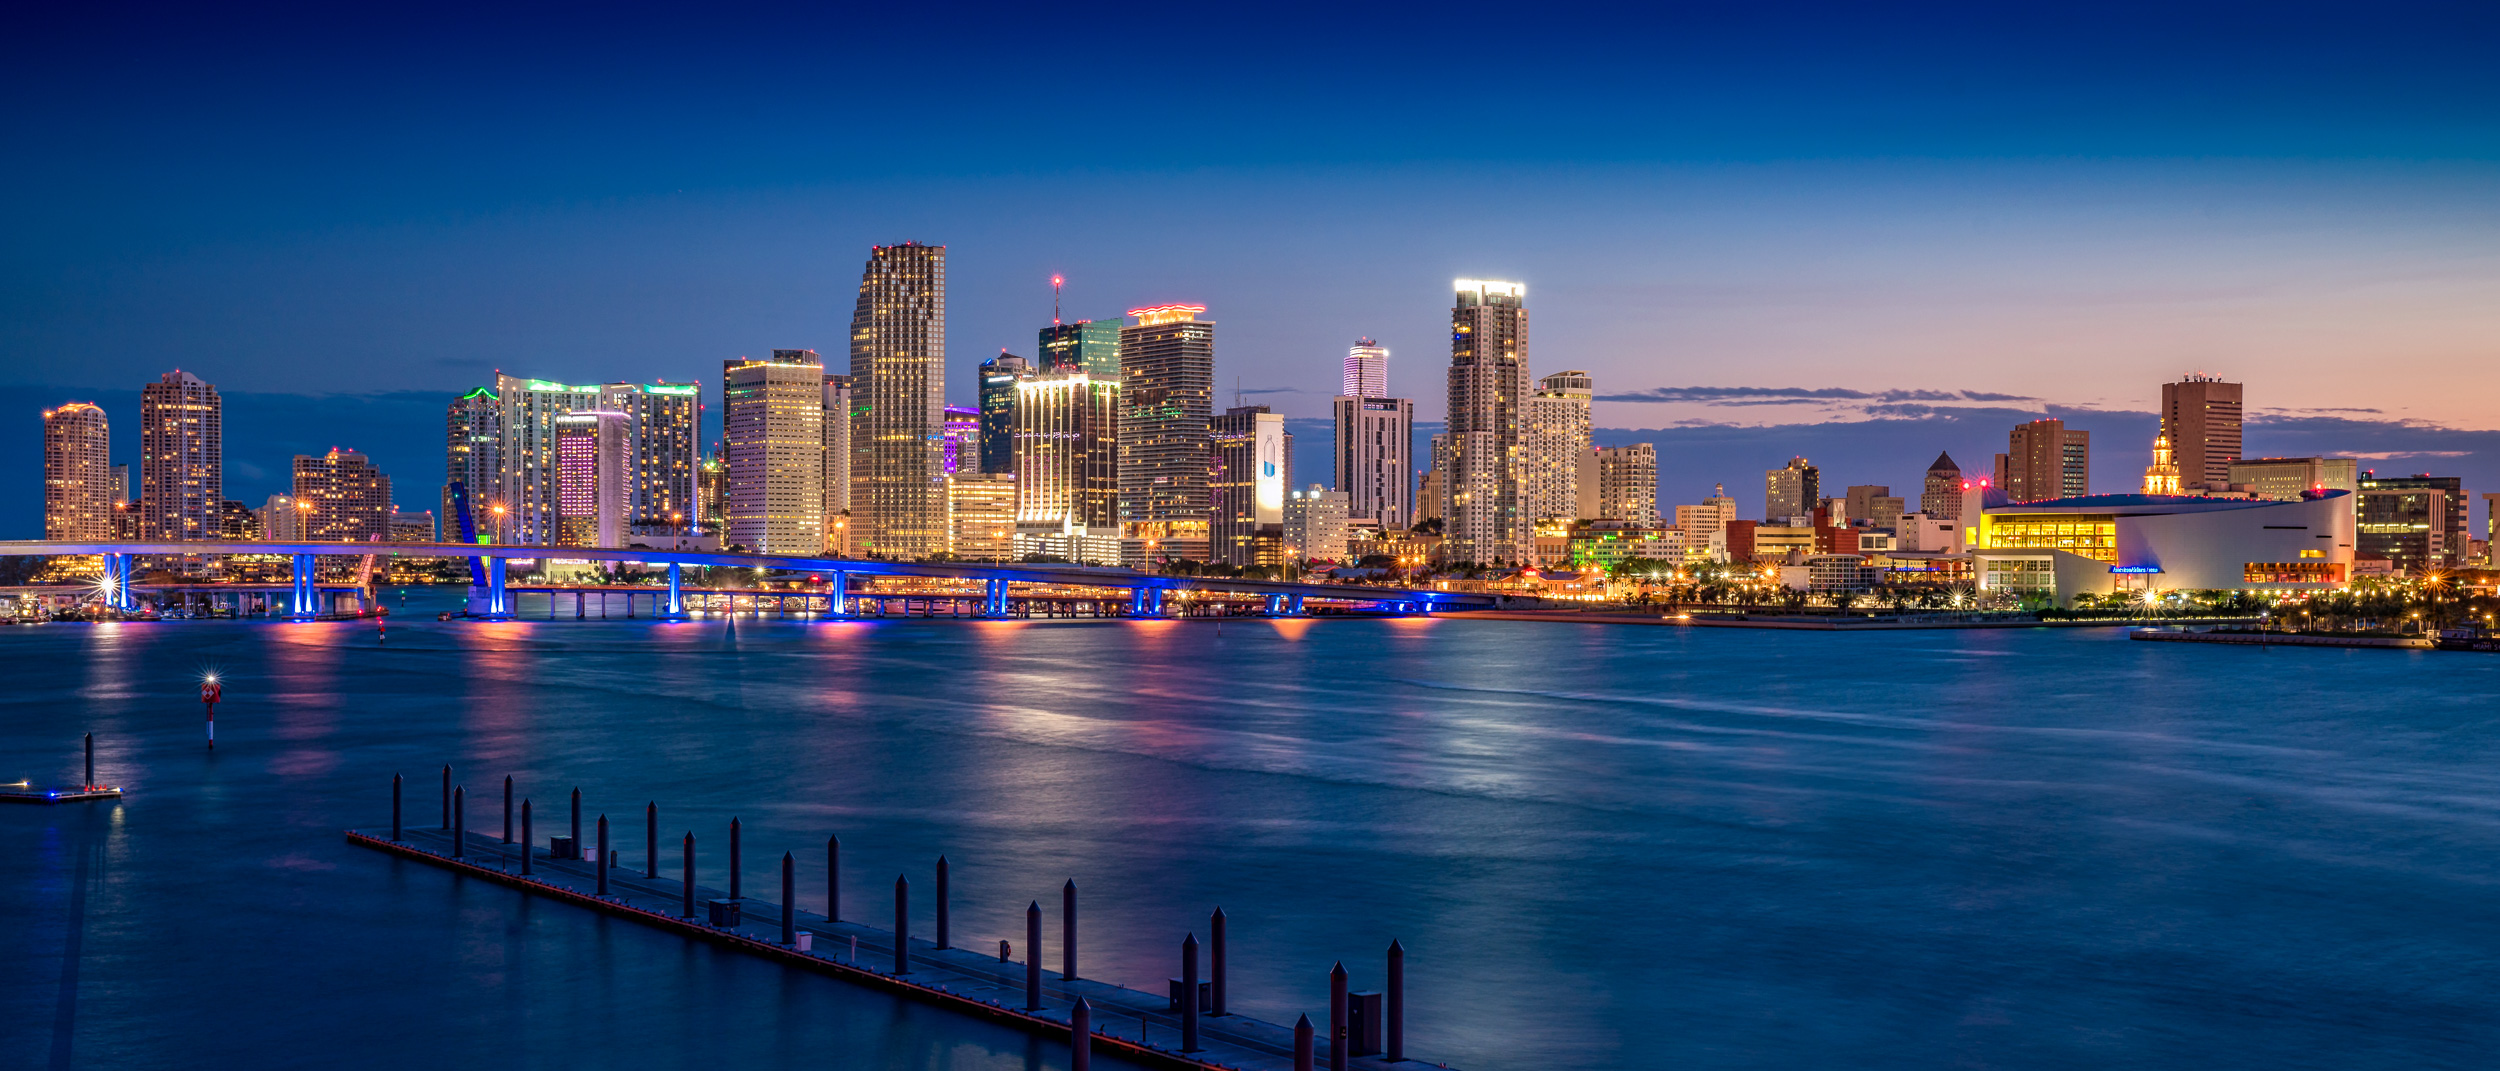 Miami_Downtown_Skyline_night_commercial_photographer_Franklin_Castillo--Edit.jpg